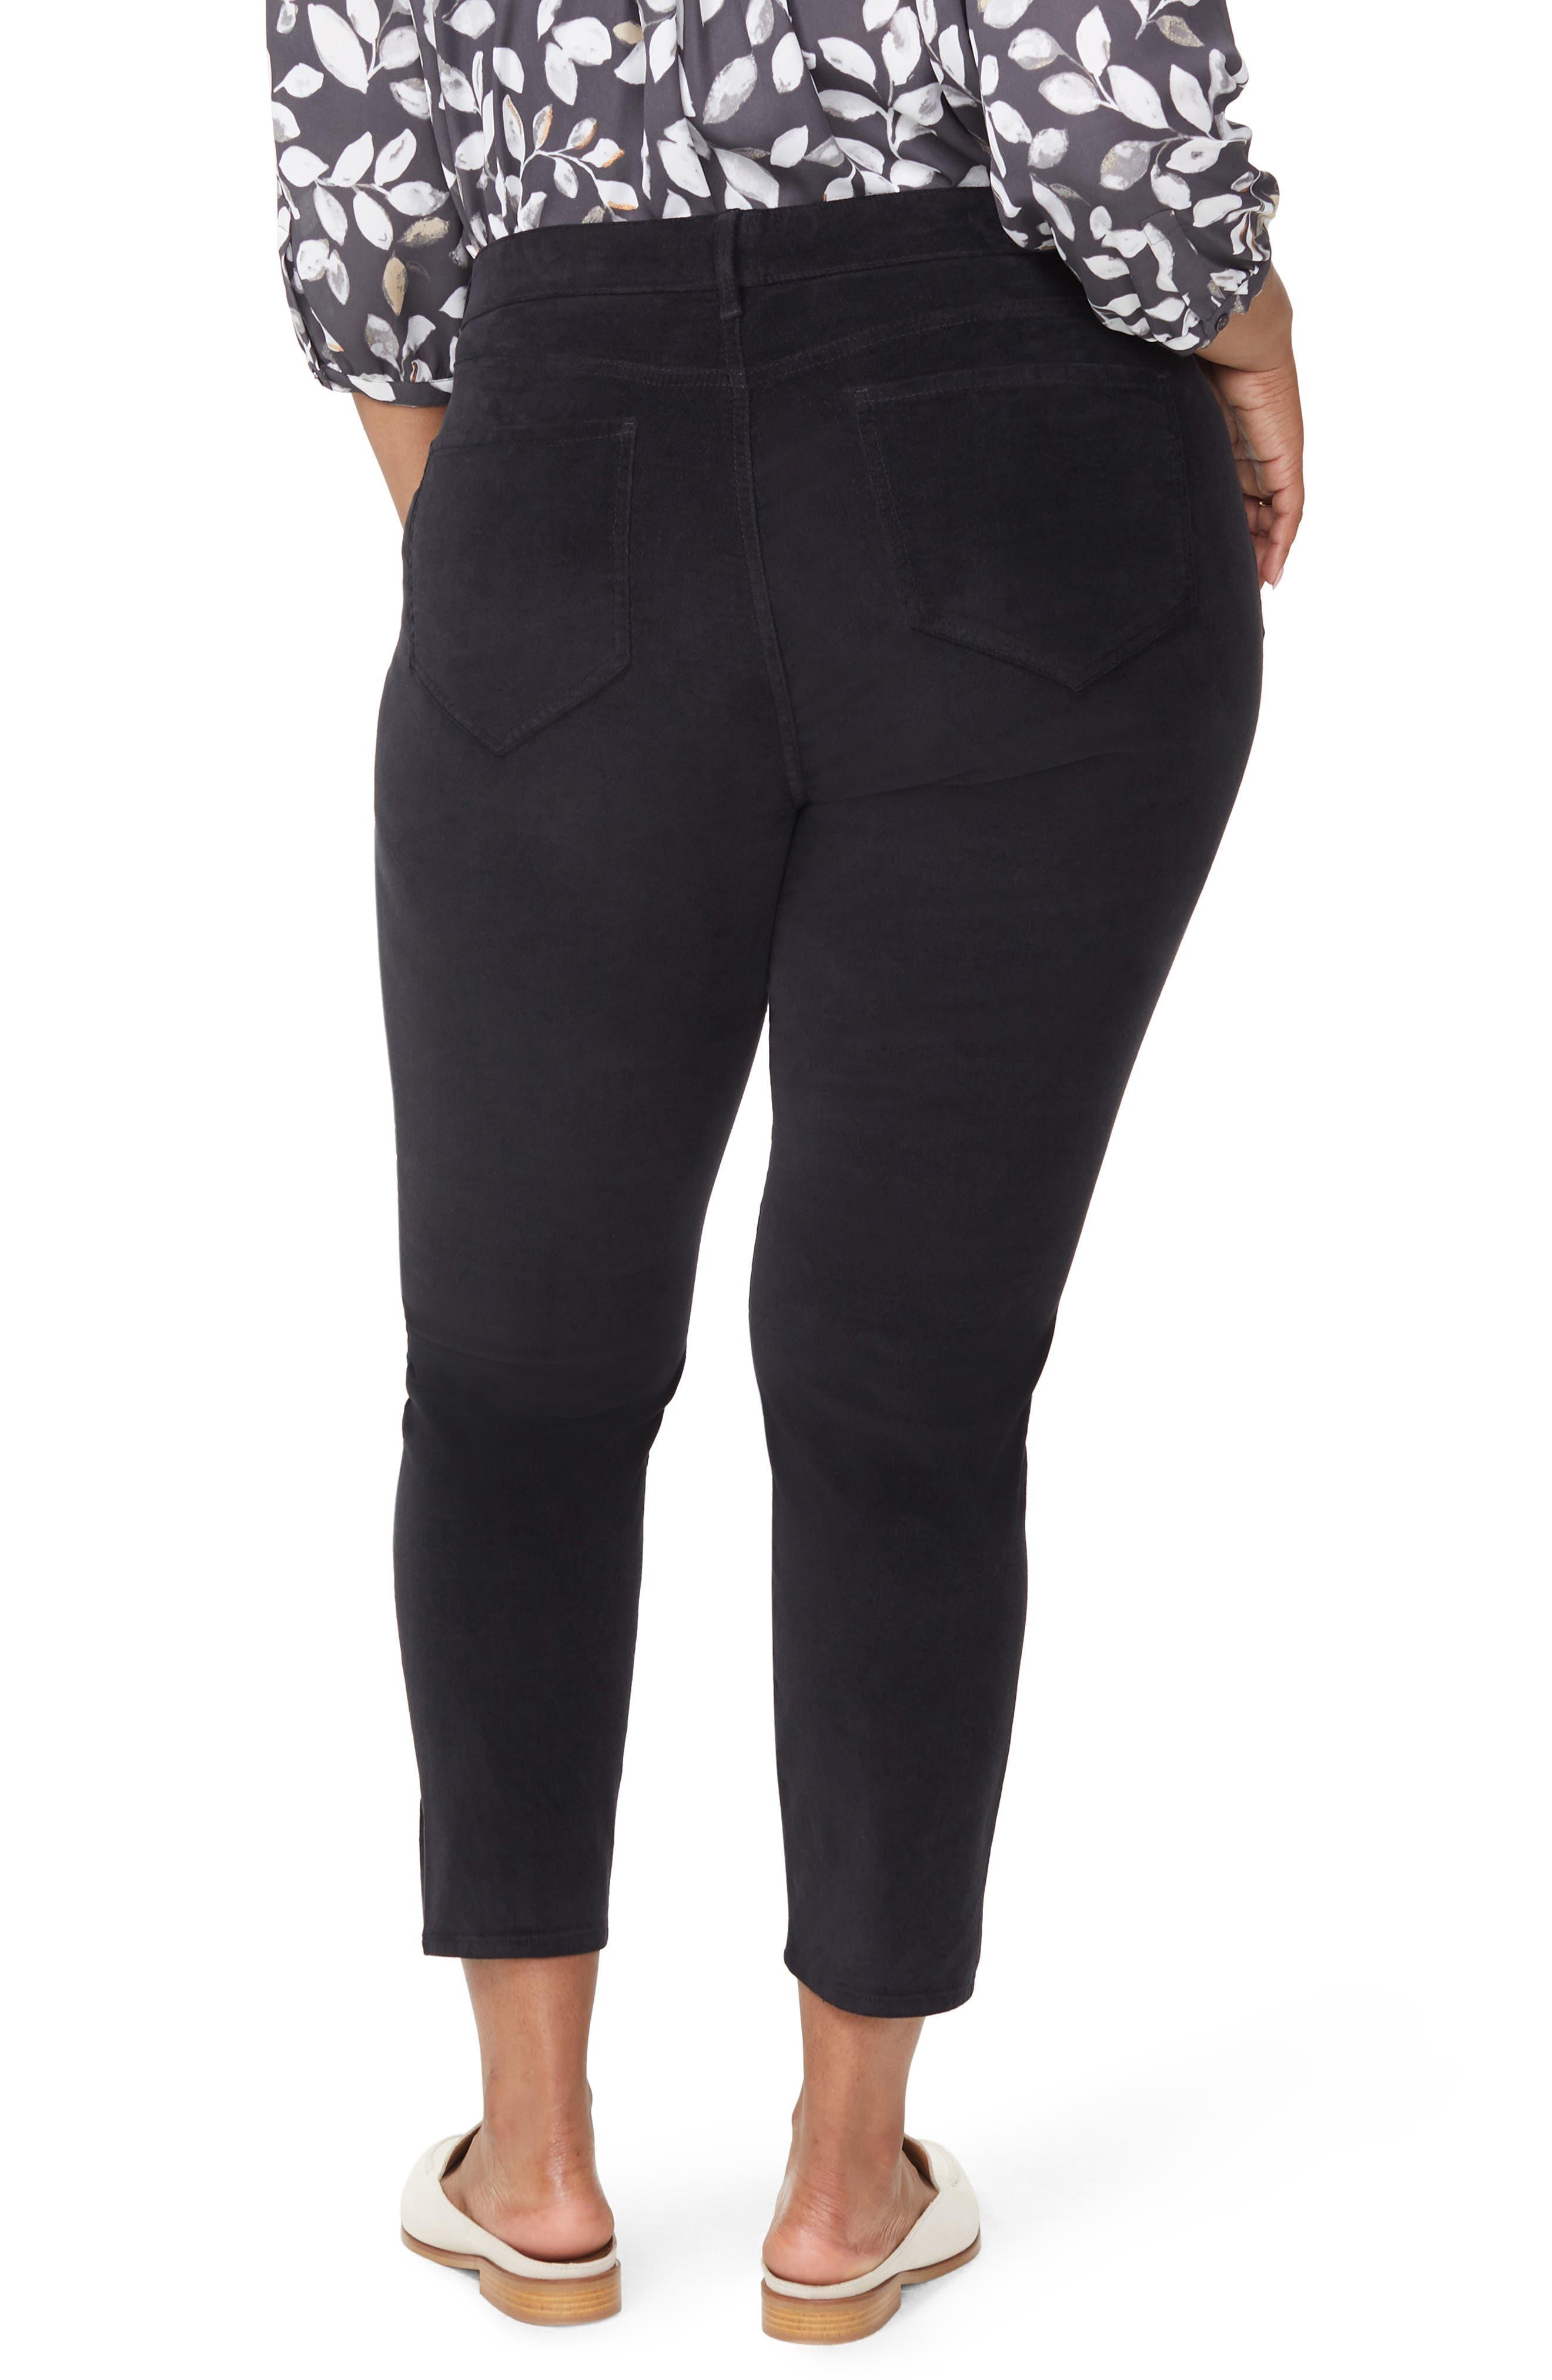 Ami Twist Seam Ankle Slit Velvet Pants,                             Alternate thumbnail 2, color,                             BLACK